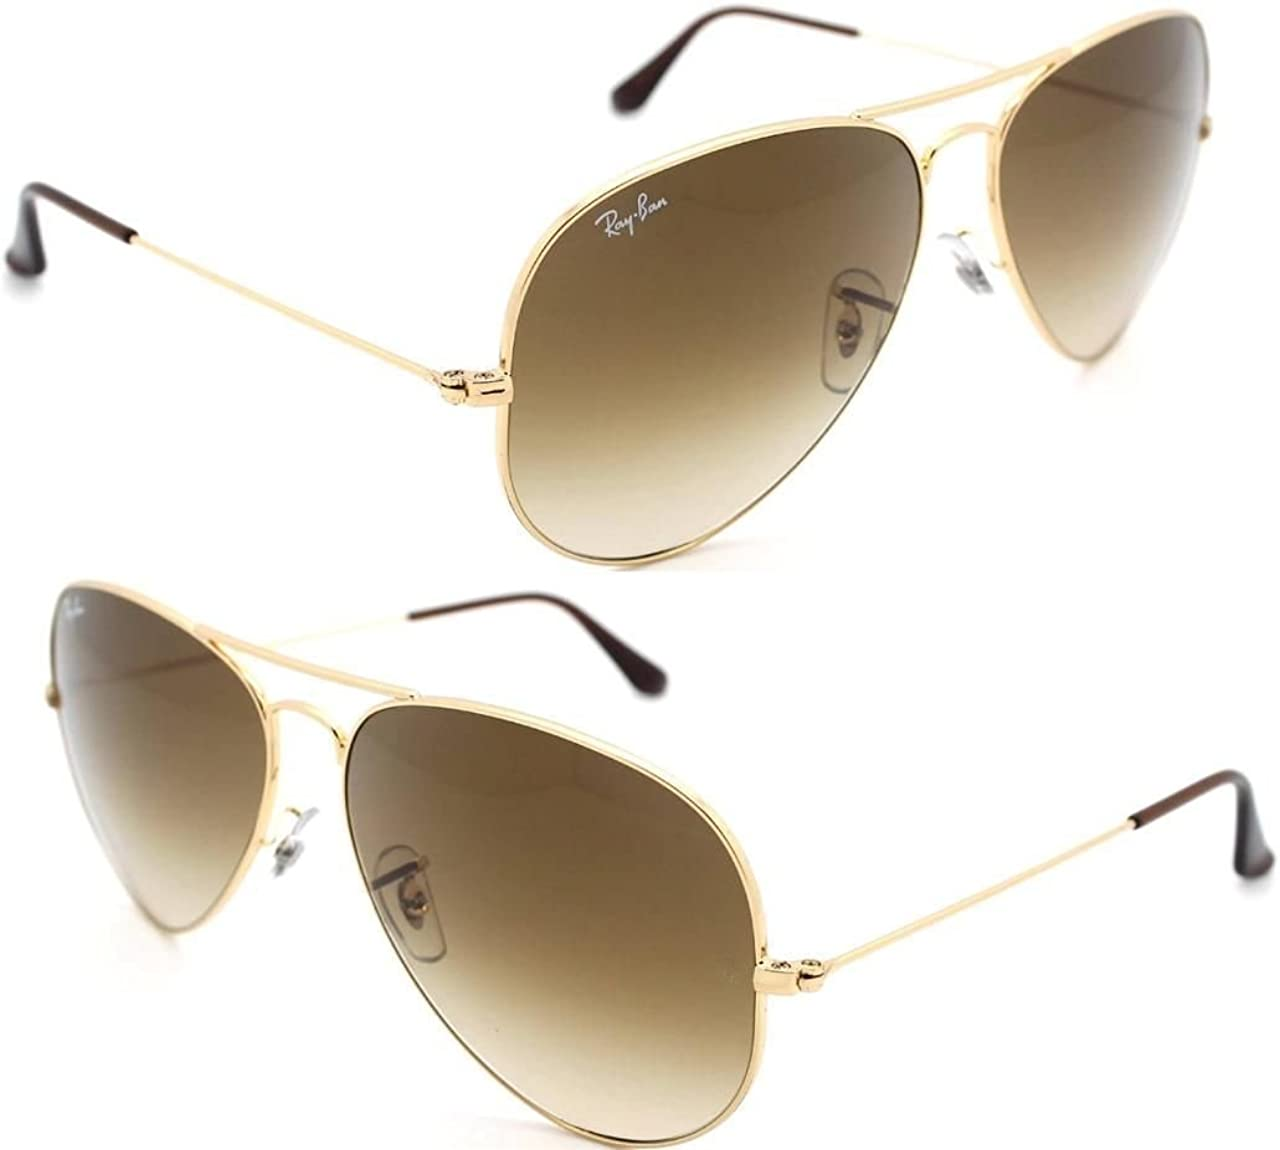 gafas ray ban aviator 3025 originales